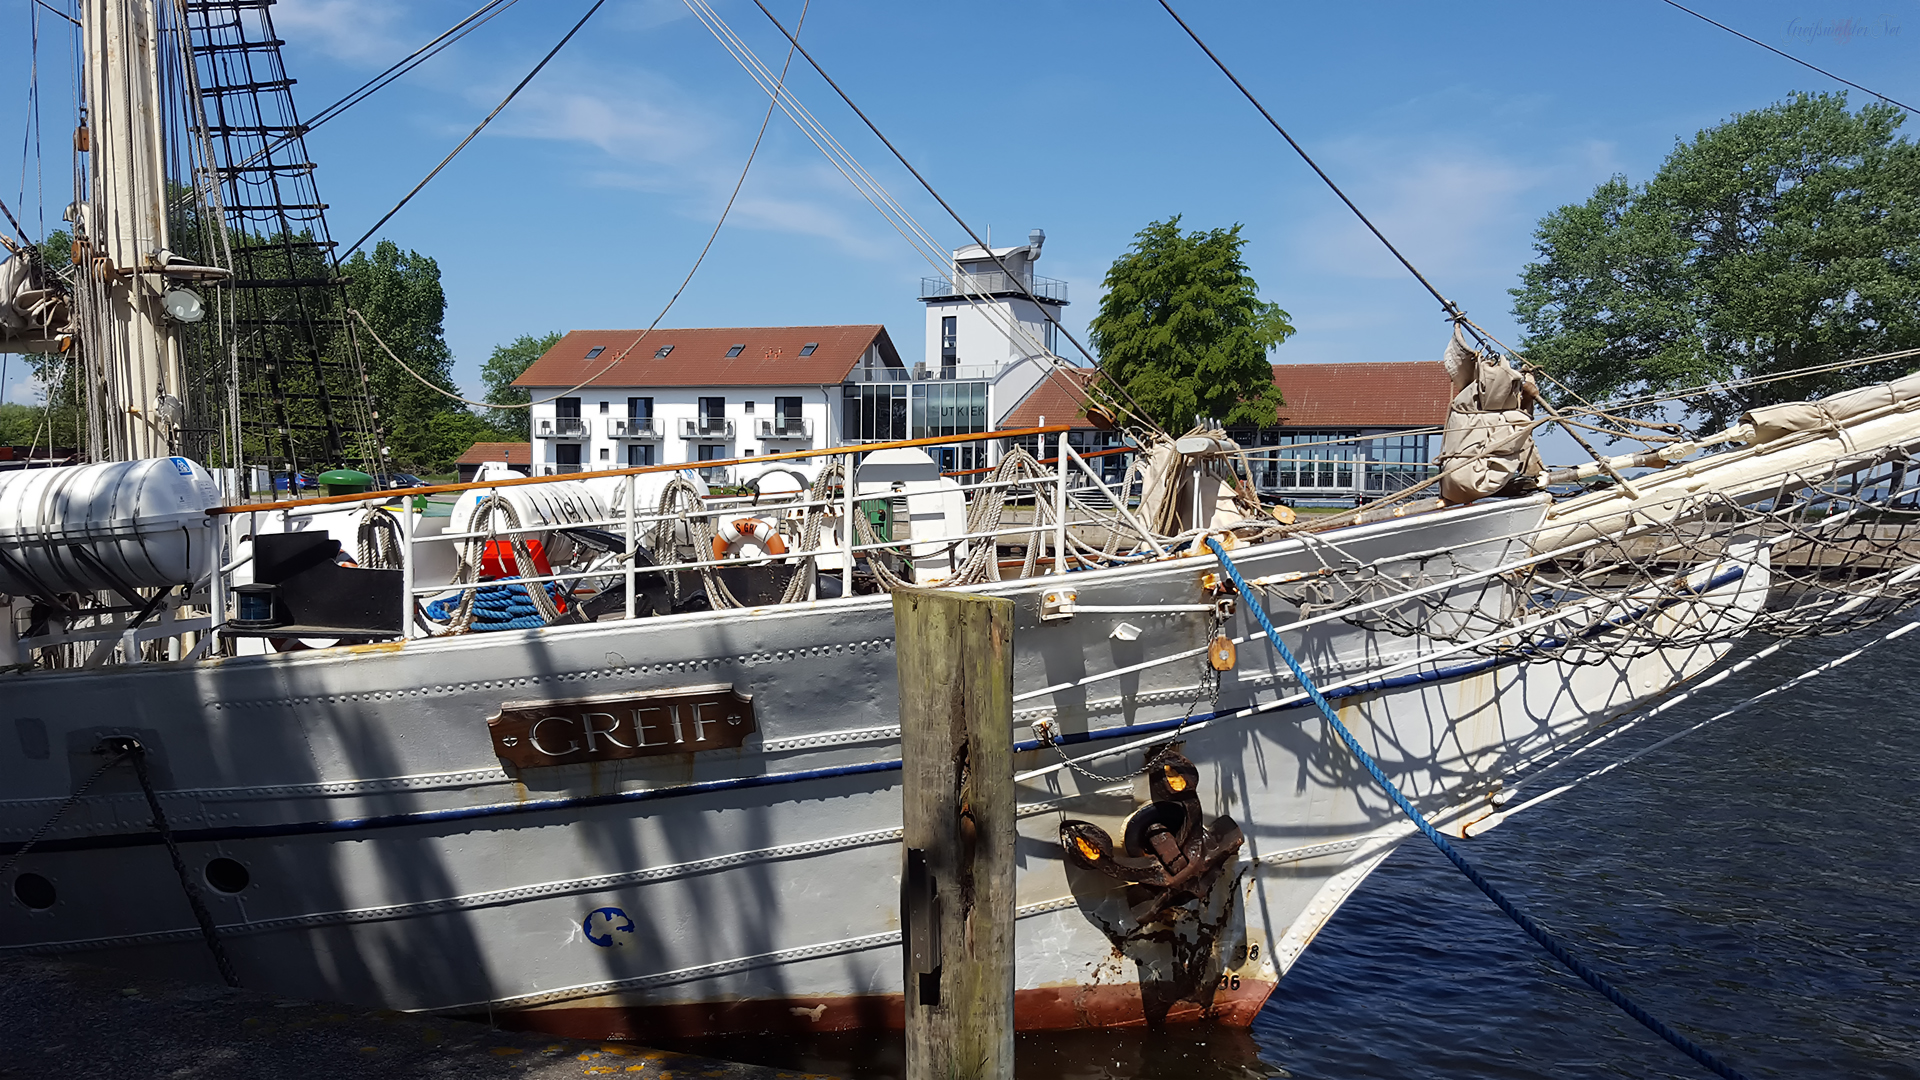 Erholung in Greifswald-Wieck - Segelschulschiff Greif, Hotel Utkiek